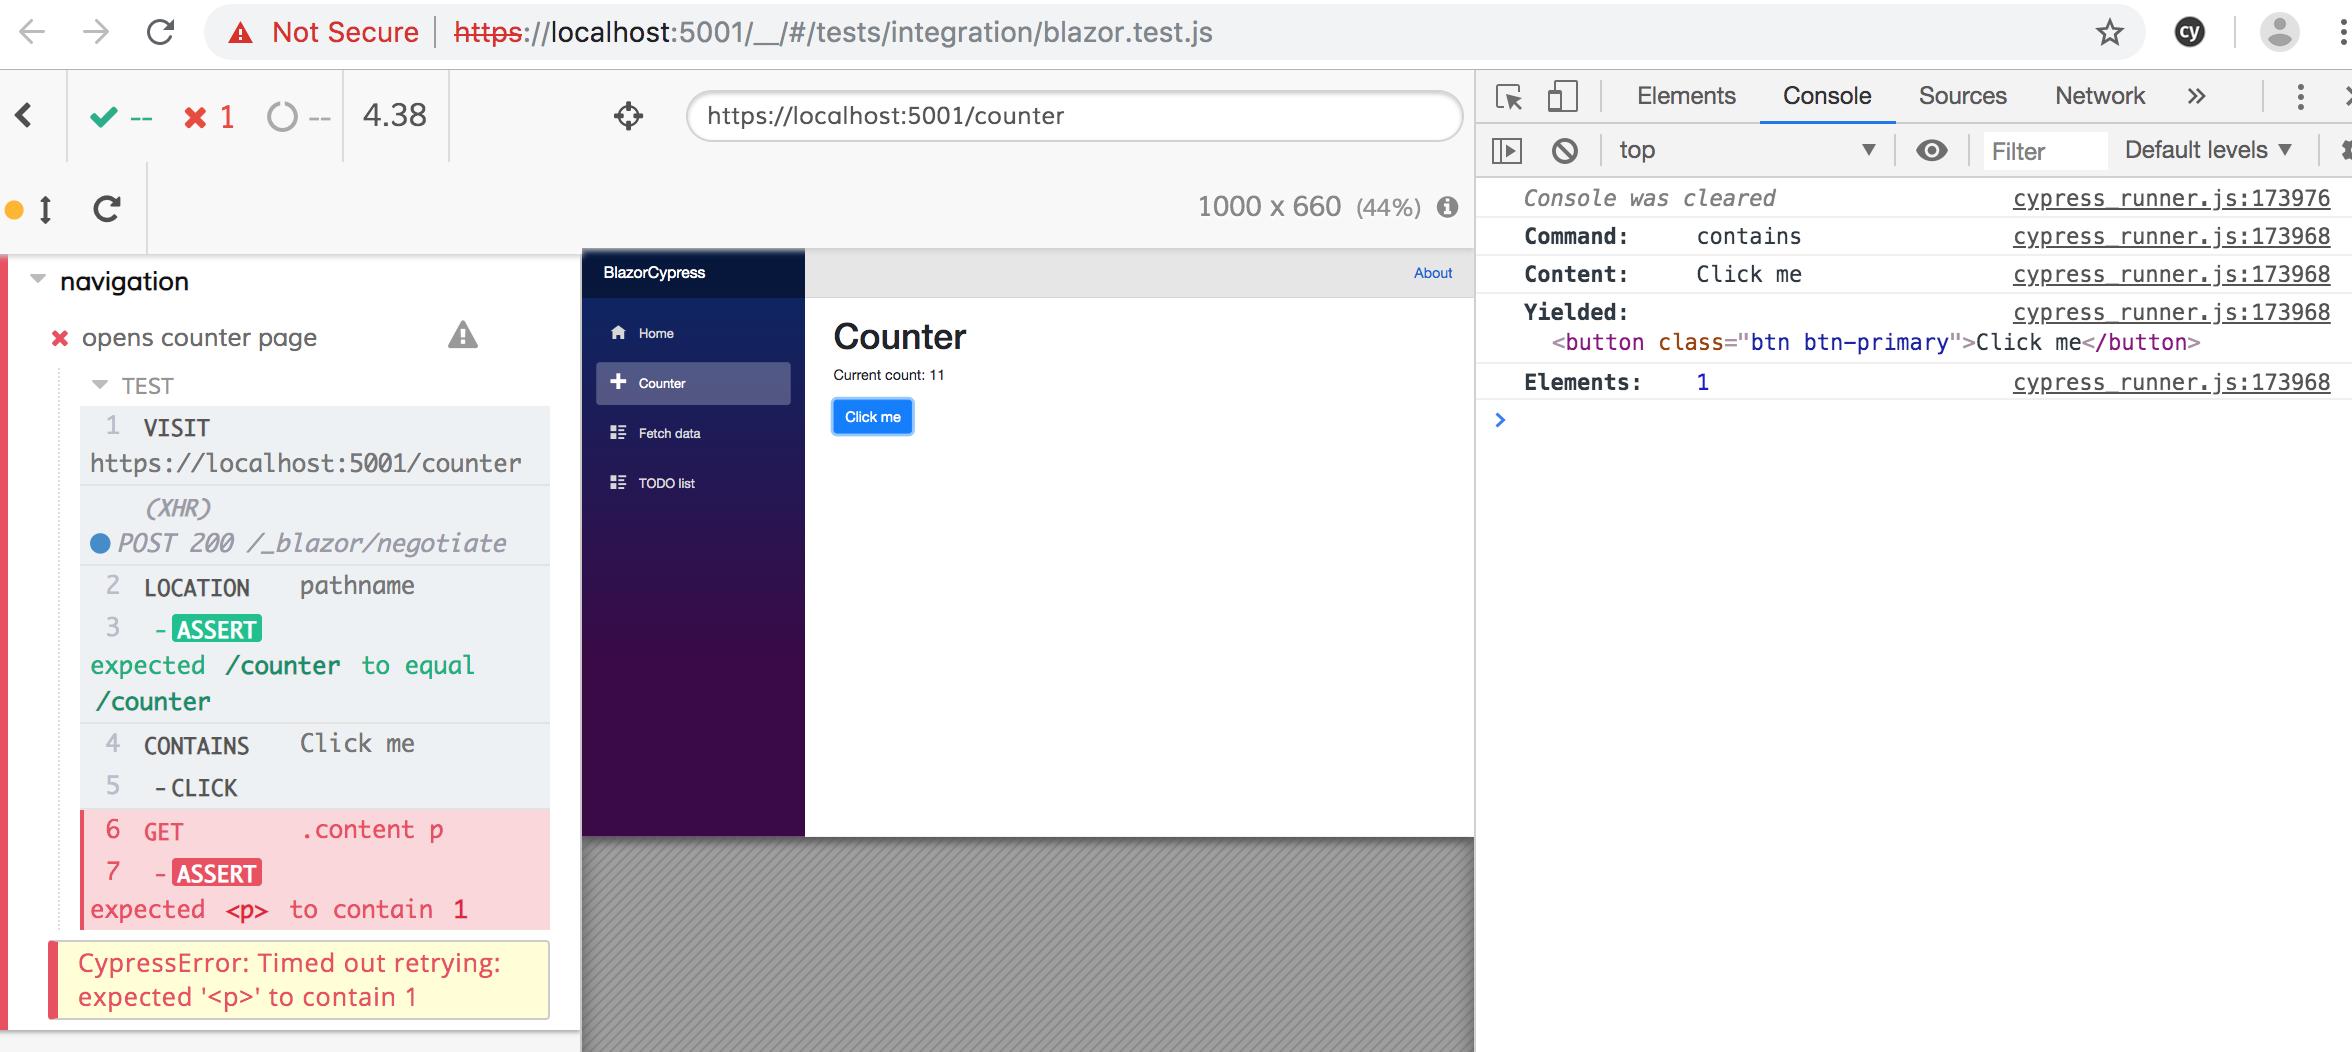 click event not propagated on ASP NET Core Blazor app button